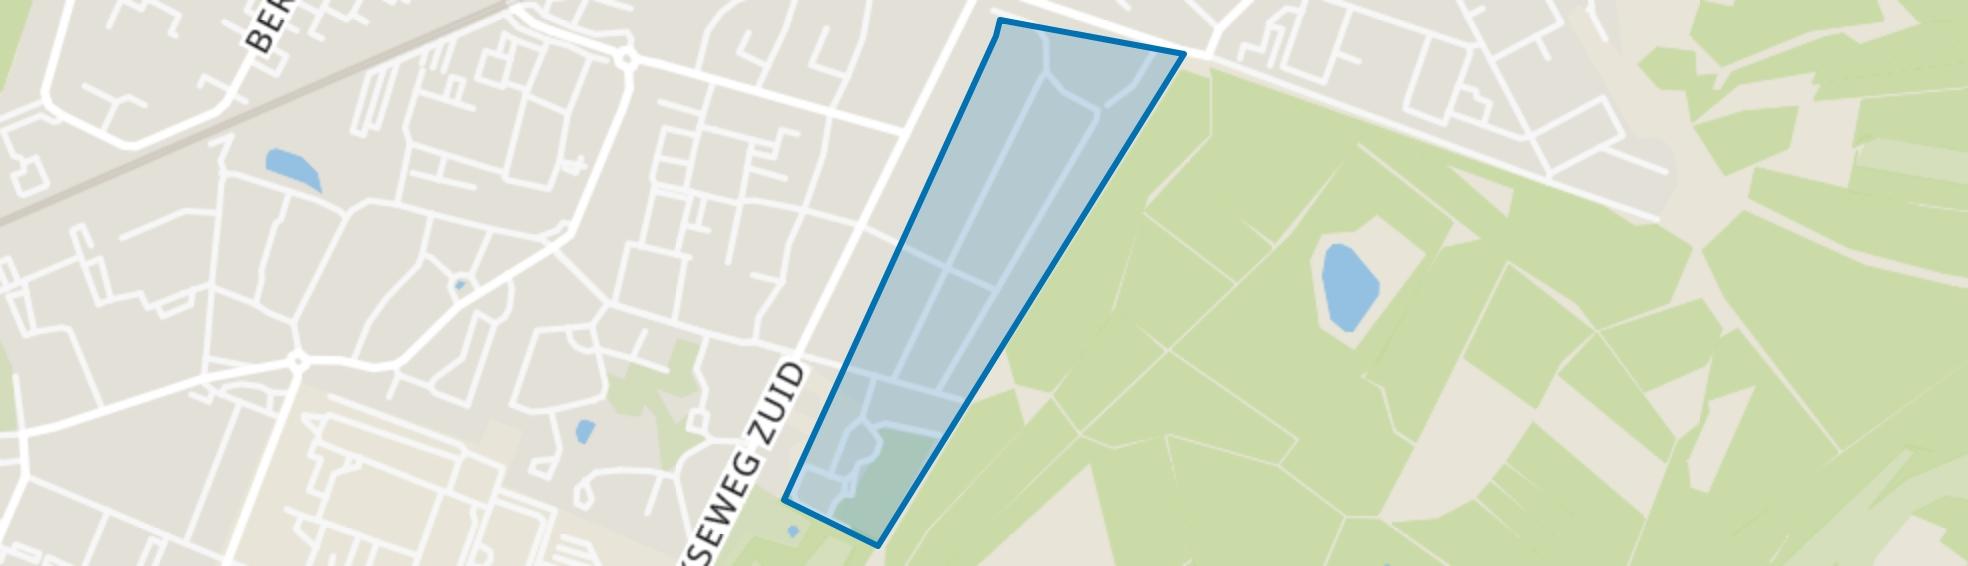 Overbosch, Bilthoven map